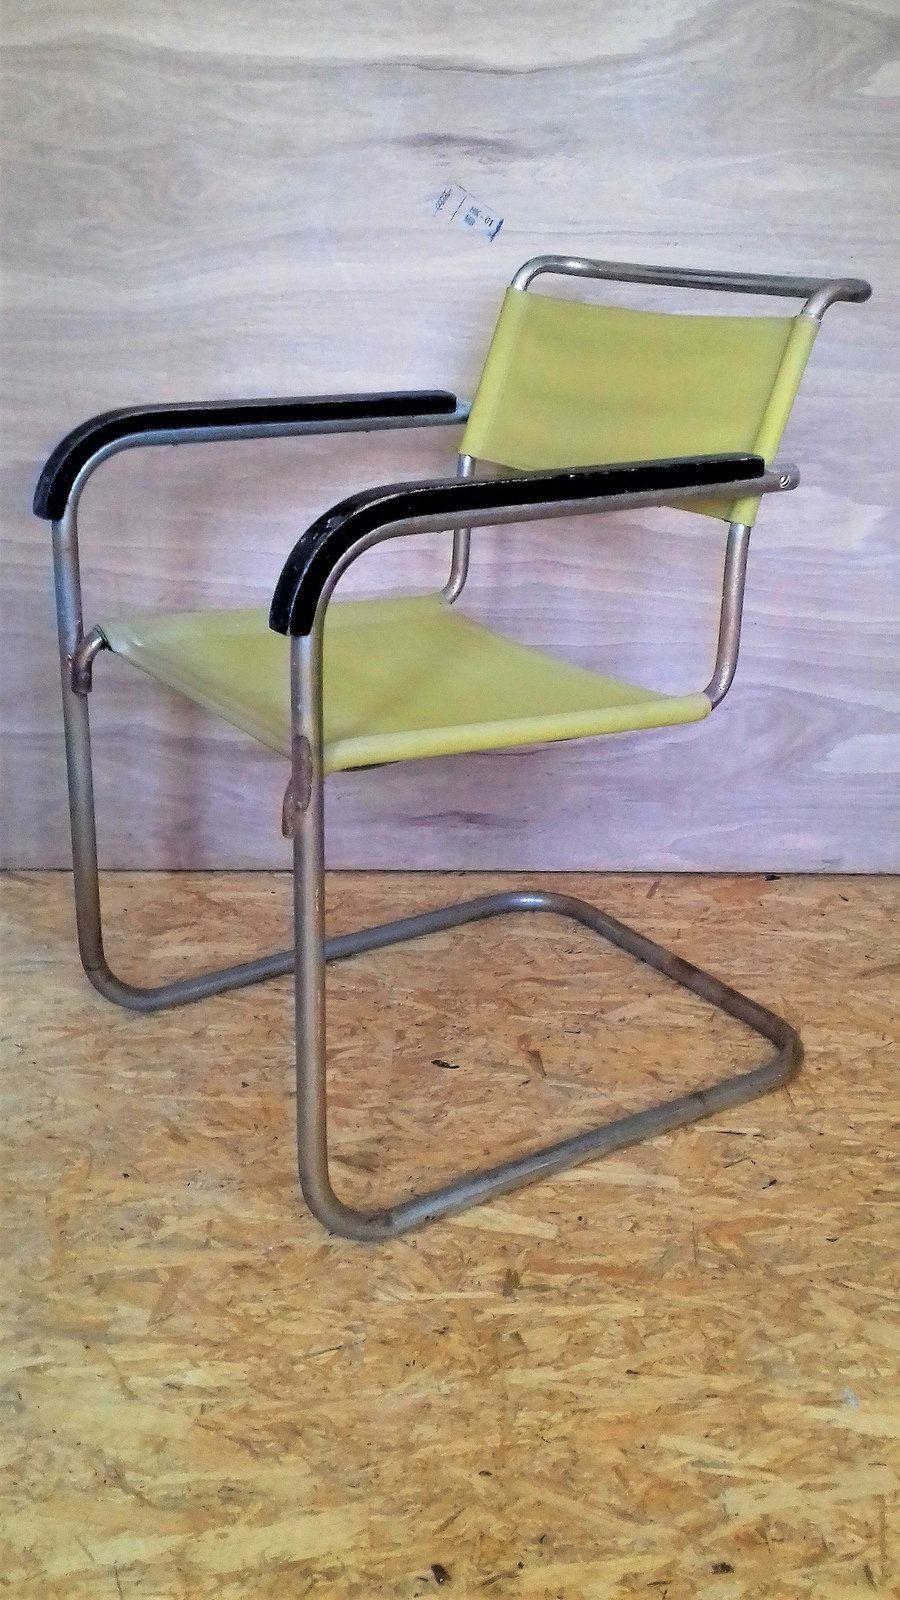 Bauhaus chair breuer - Find This Pin And More On Bauhaus